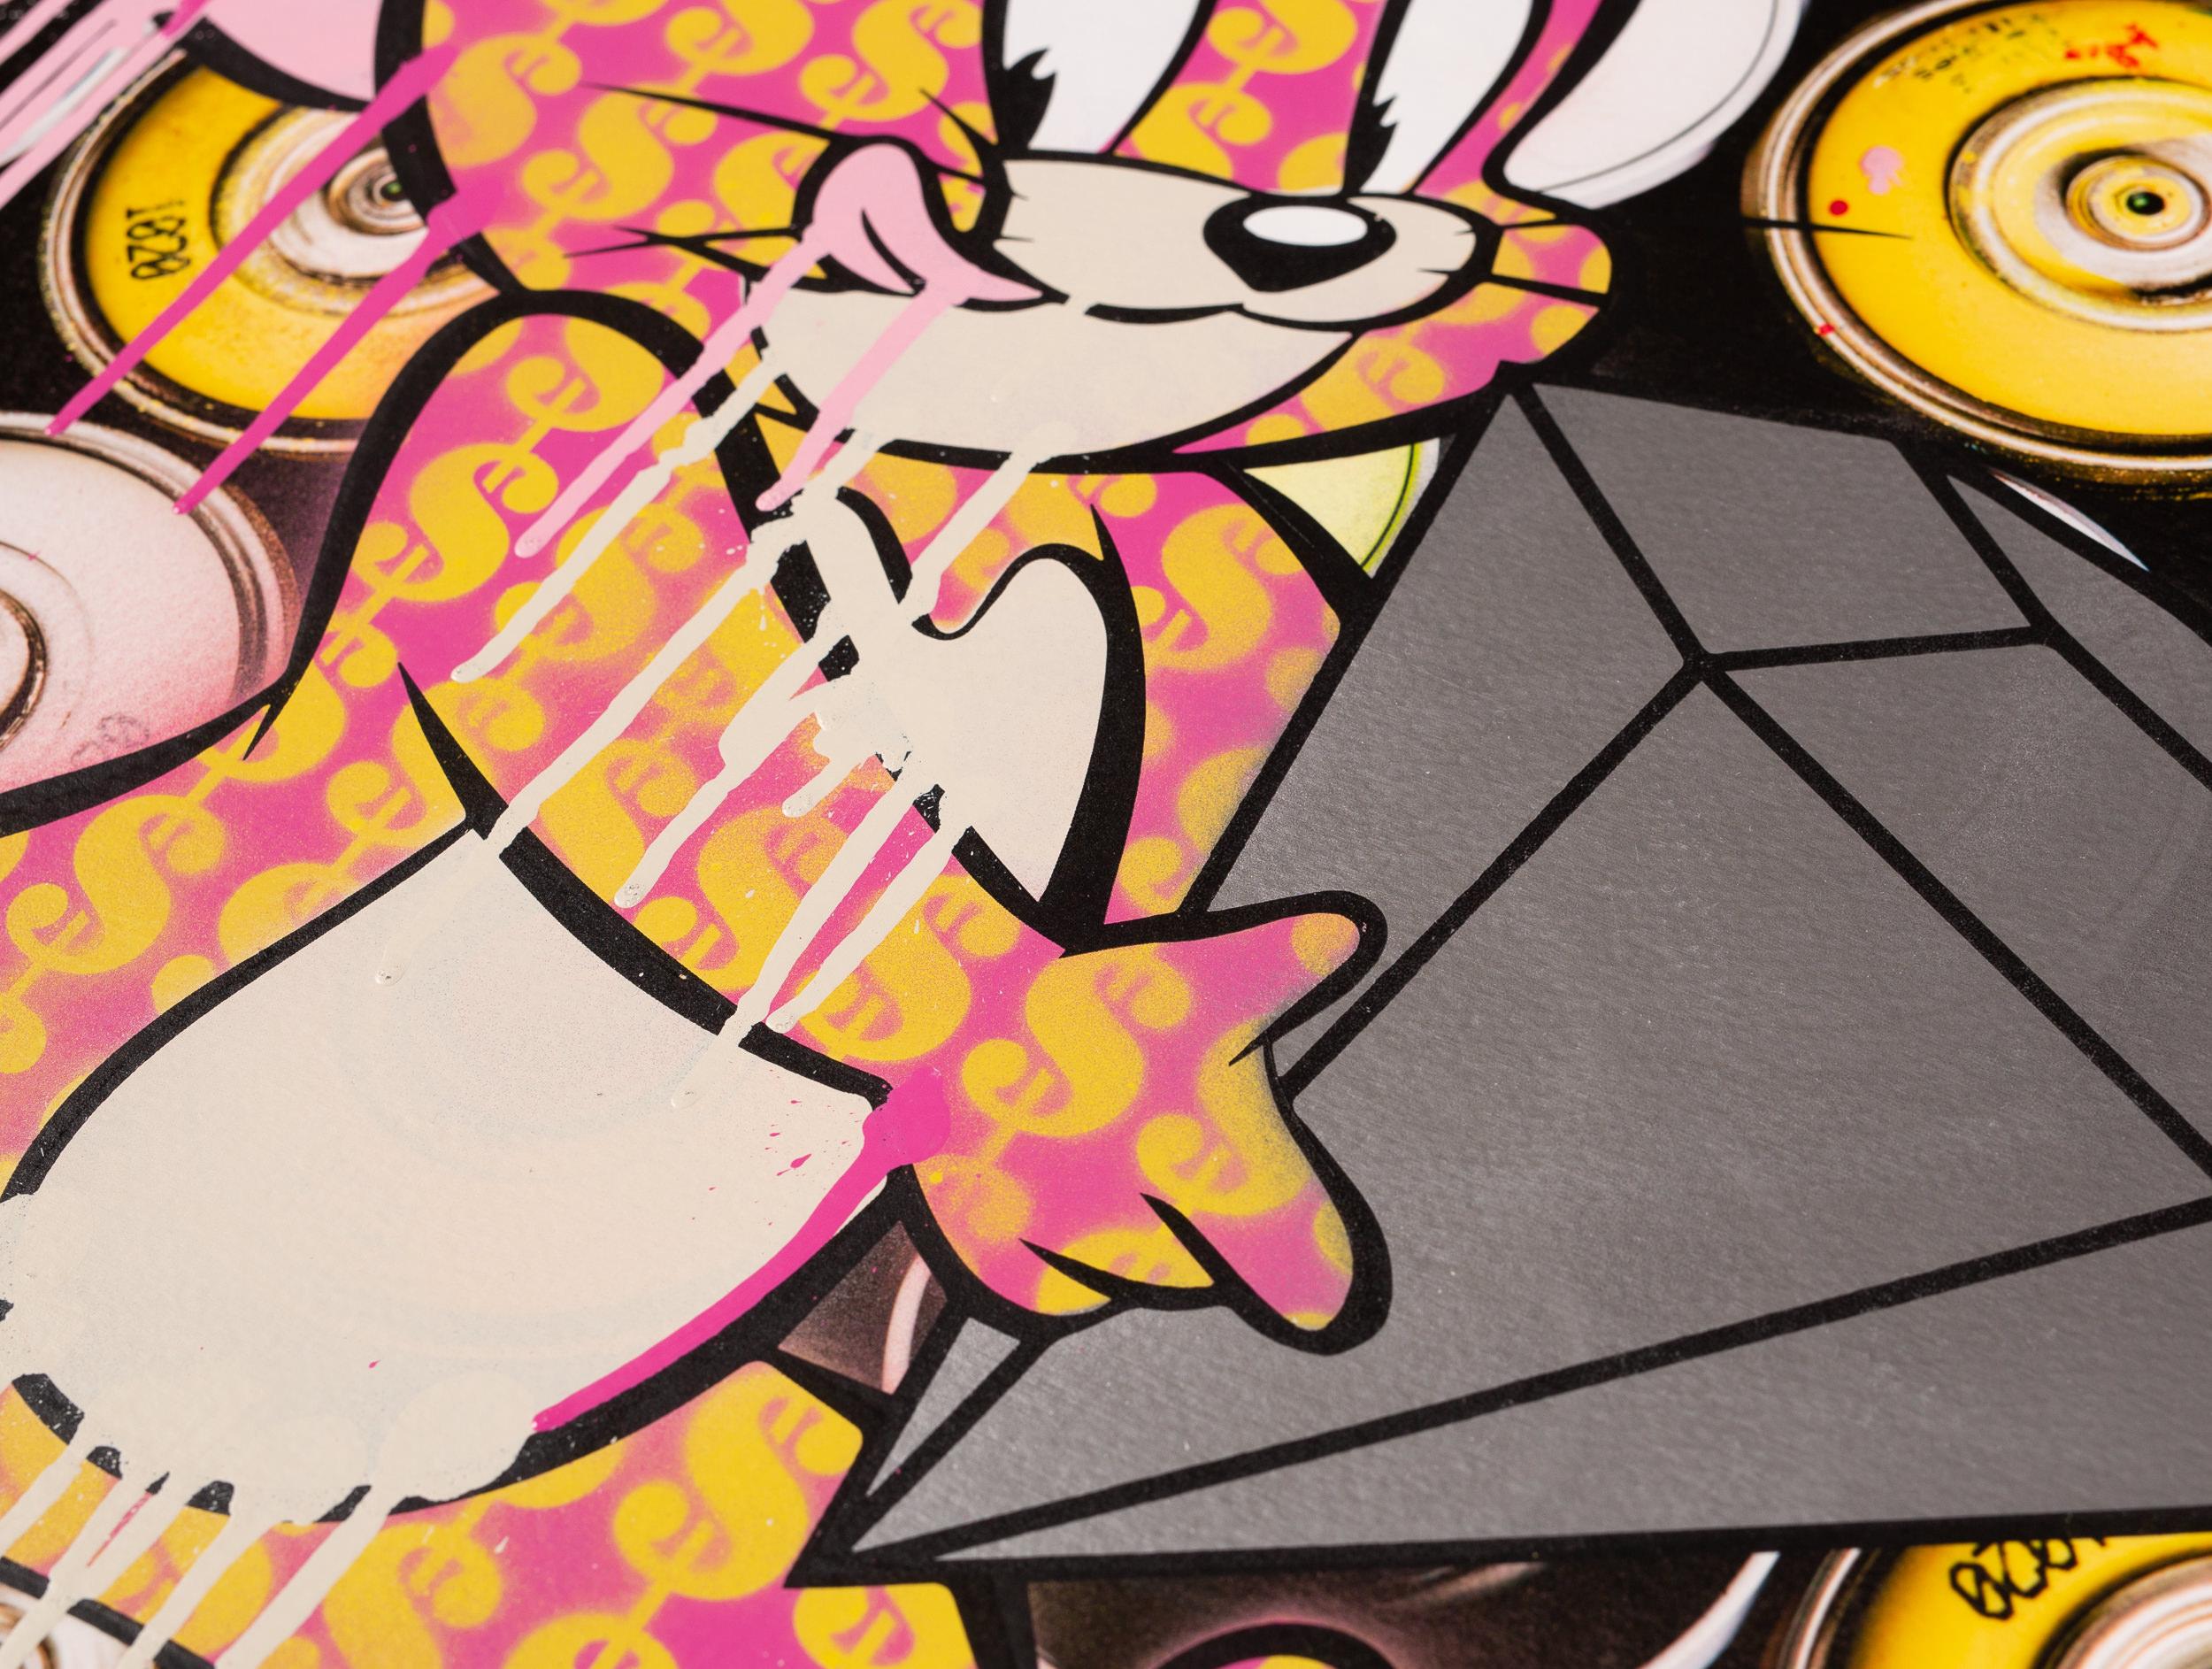 Popaganda-Cans-Diamond-Mouse-Detail-01.jpg